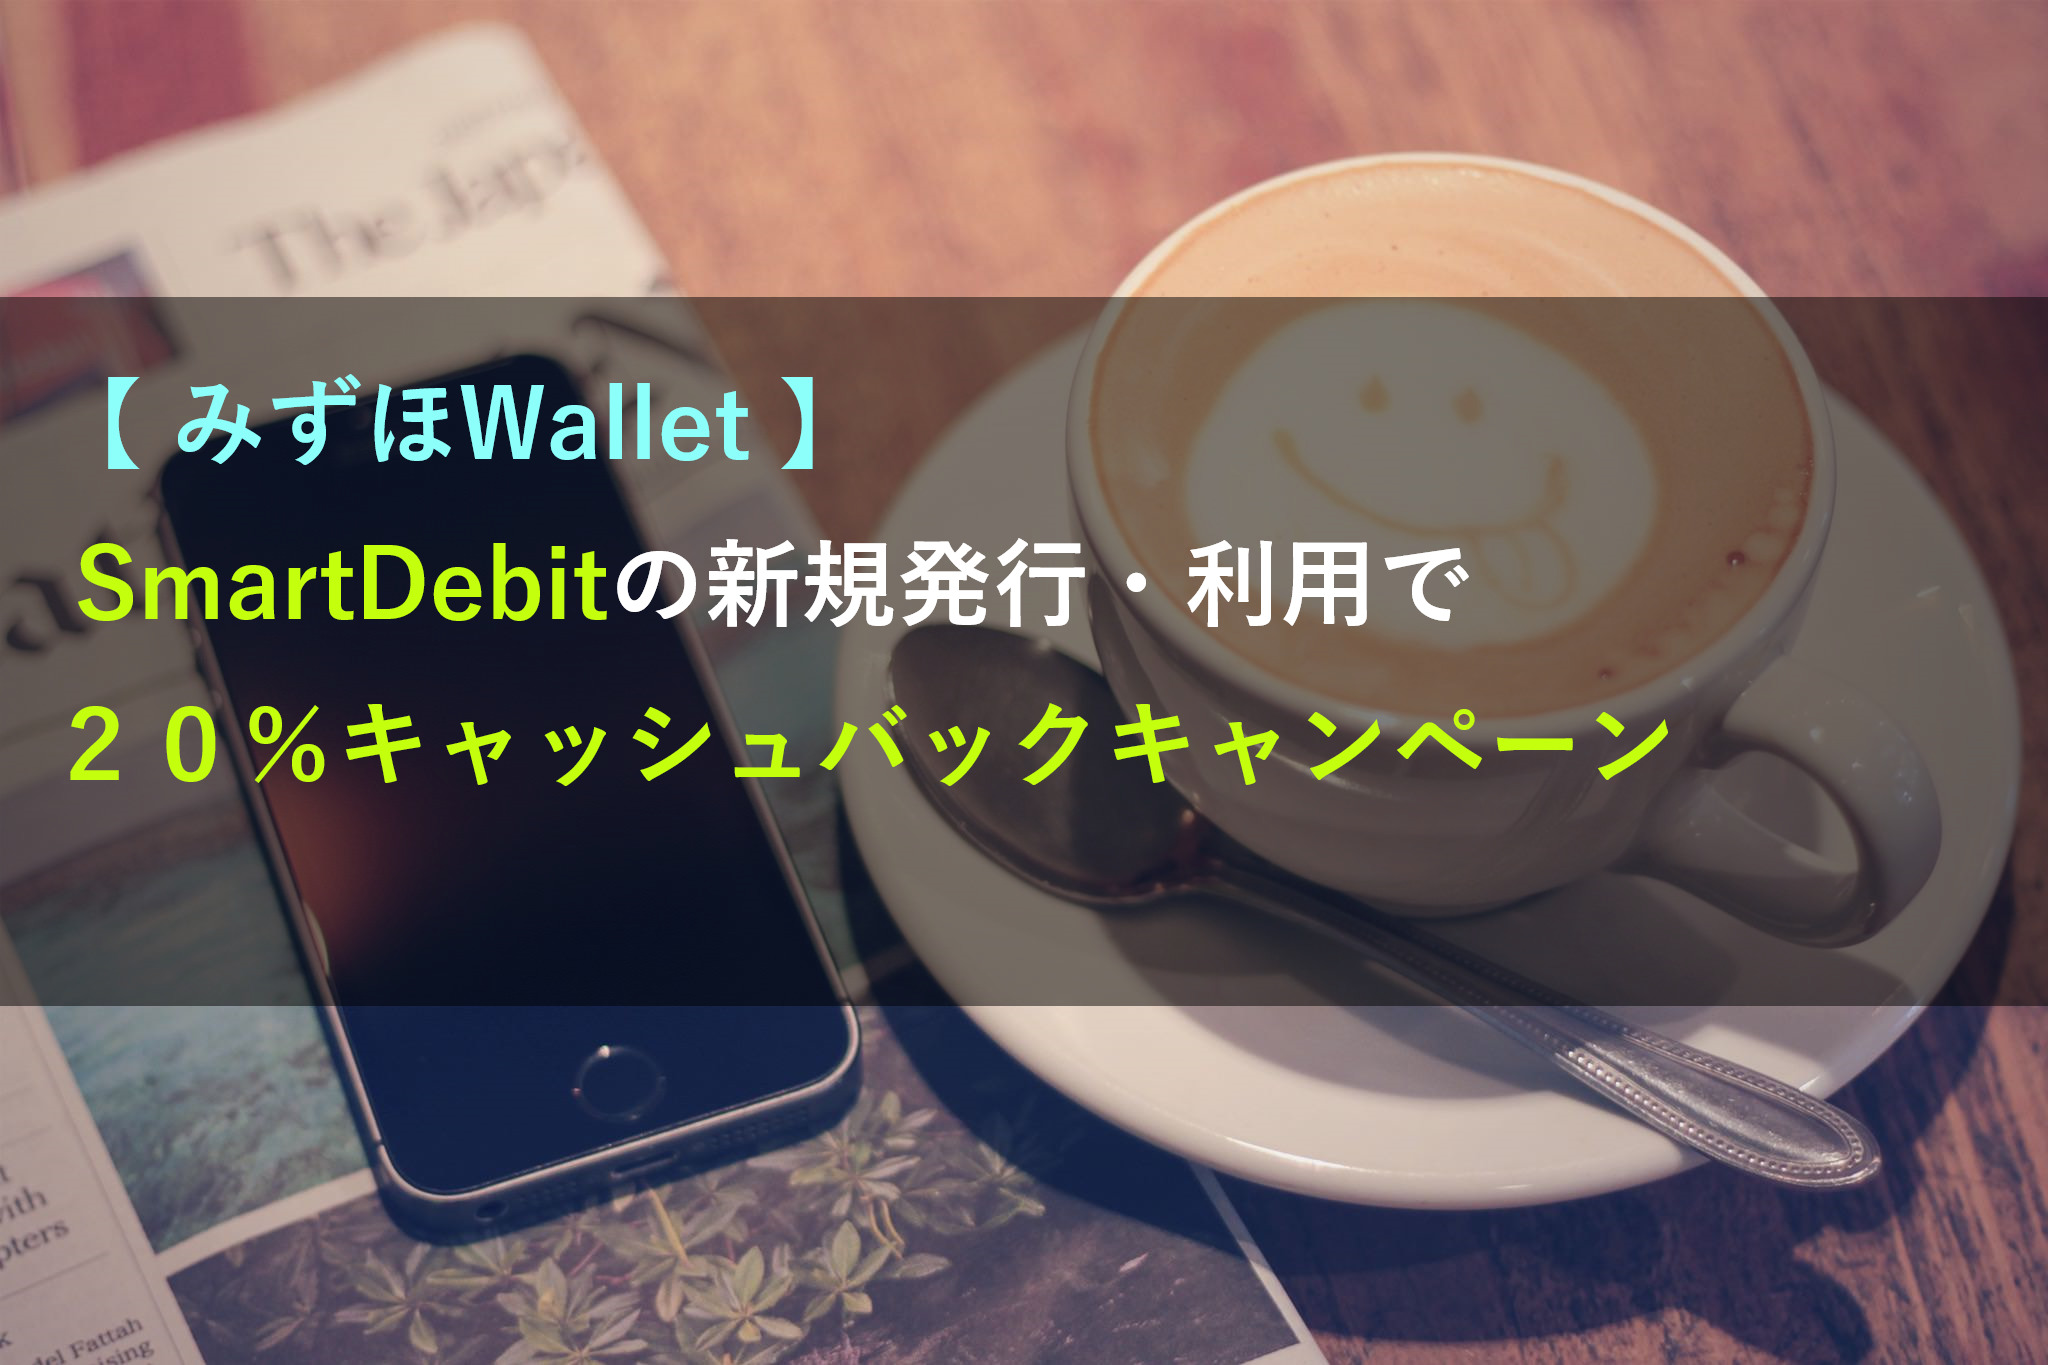 mizuho_wallet_smartdebit